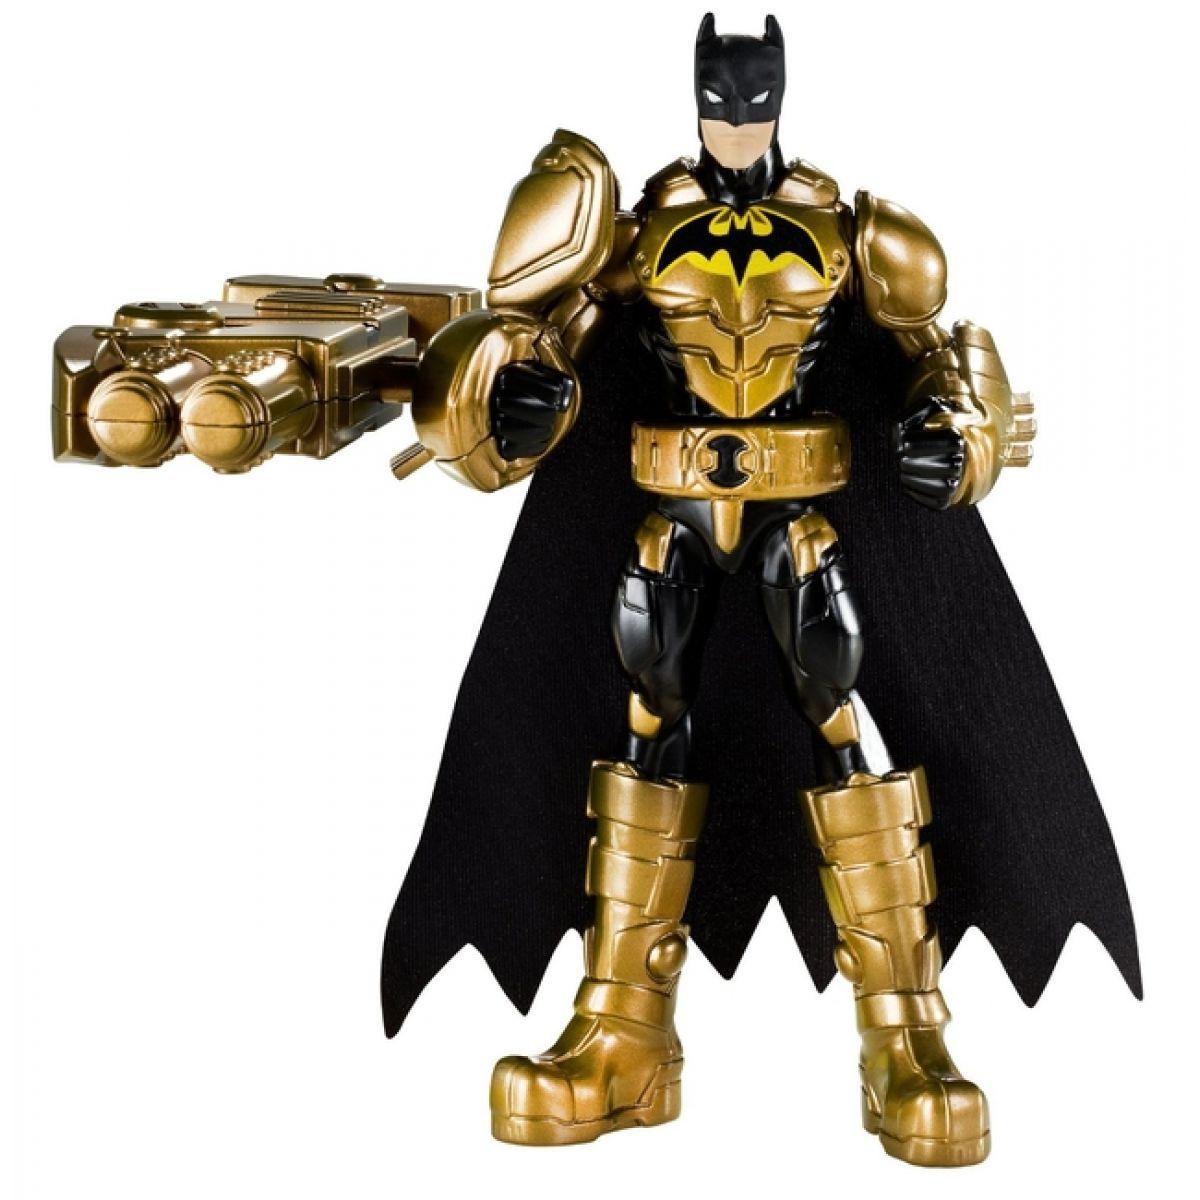 Batman bojové figurky Mattel W7256 - Batman Turbo punch